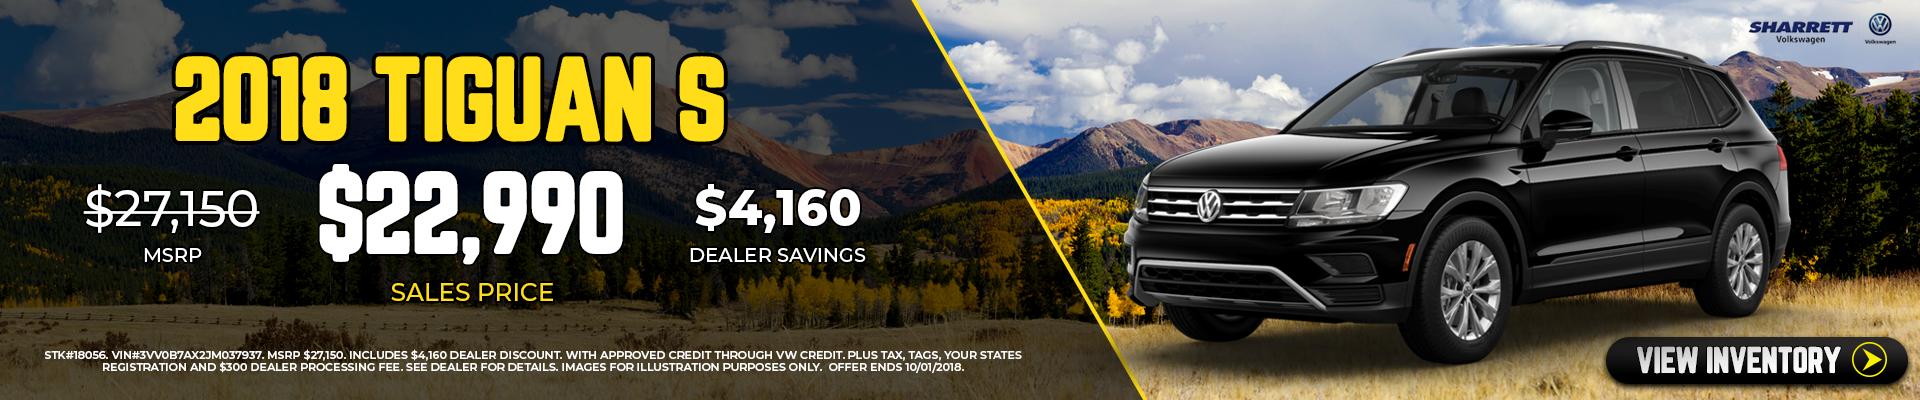 Get a new 2018 Tiguan S for $22,990 | Sharrett Volkswagen